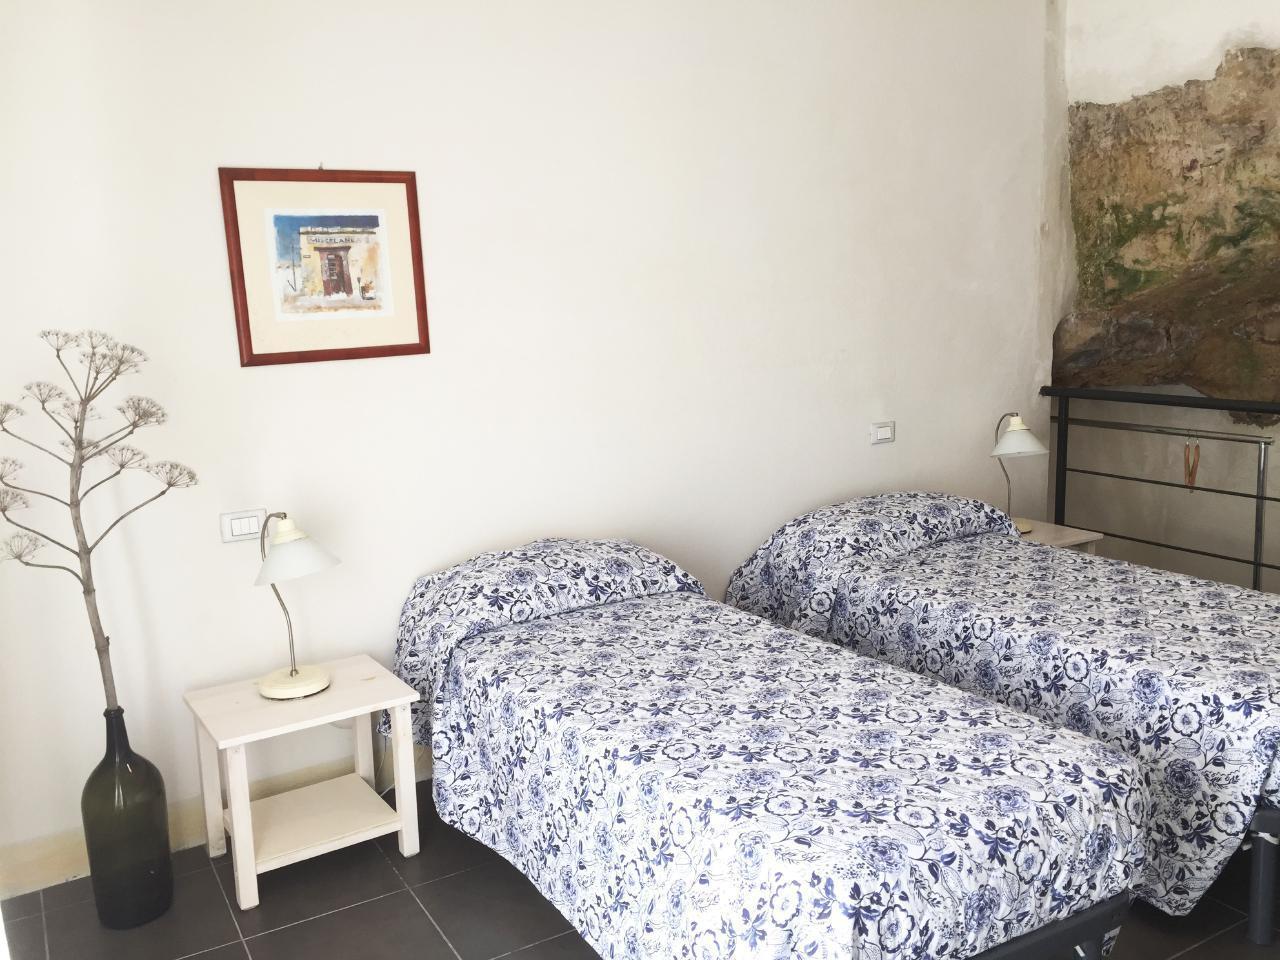 Maison de vacances Terrazza Barocca (1648450), Modica, Ragusa, Sicile, Italie, image 24